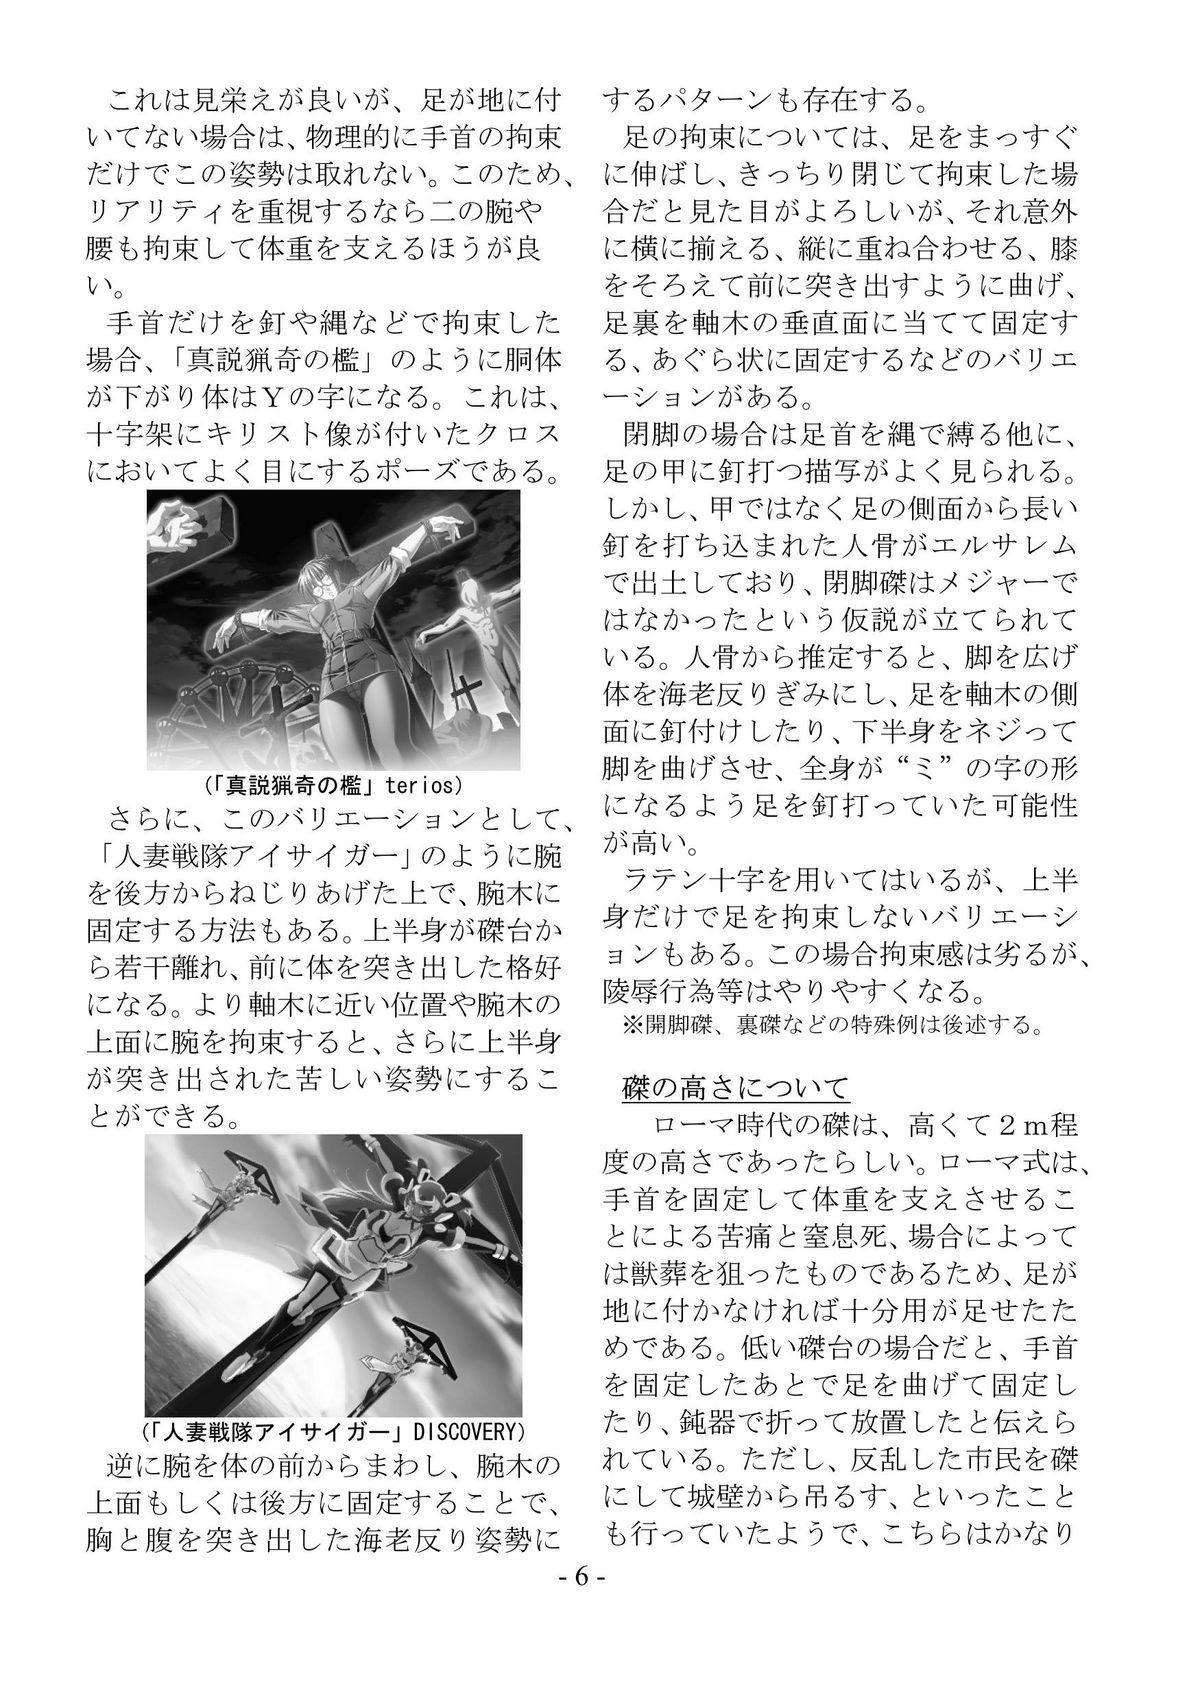 encyclopedia of crucifixion 6